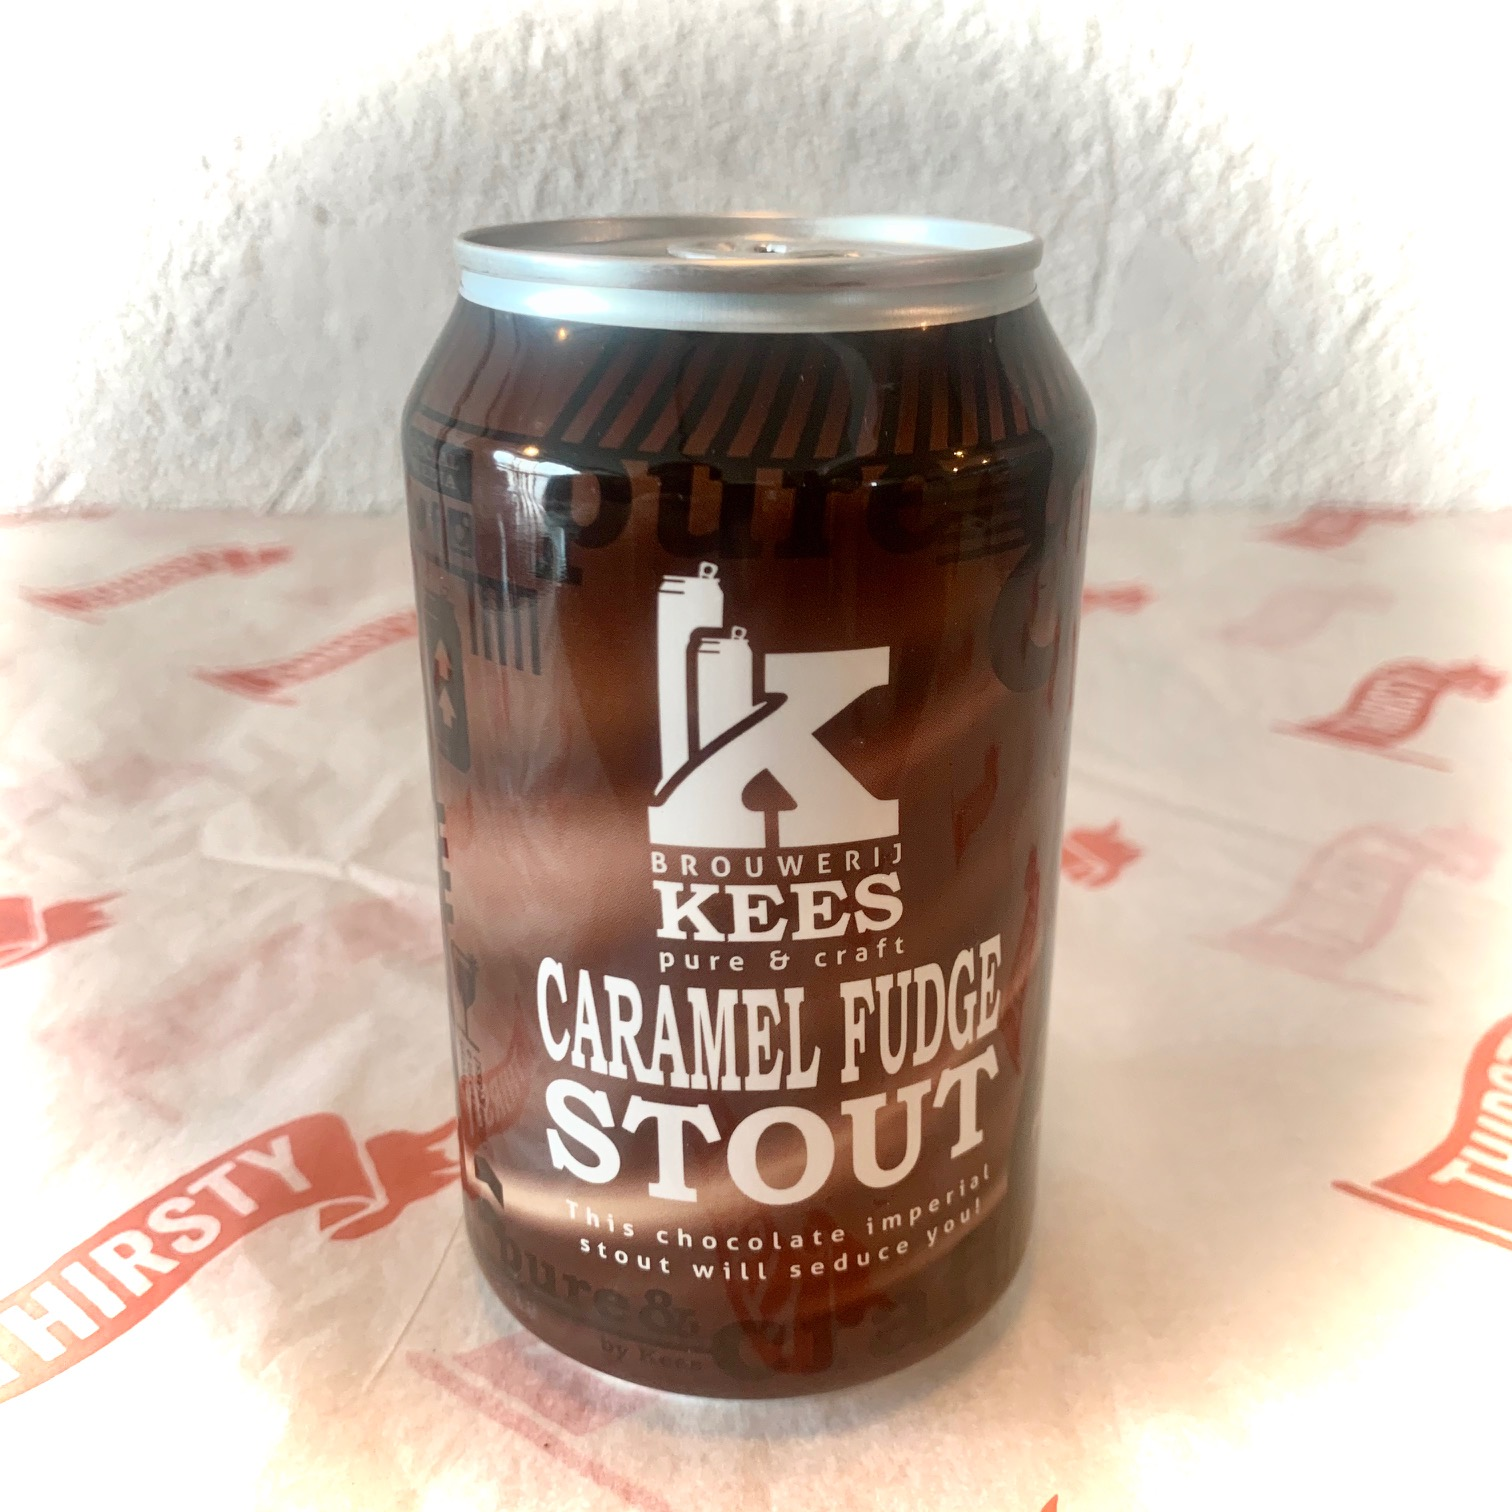 Kees | Caramel Fudge Stout | Imperial Stout 11.5% 330ml